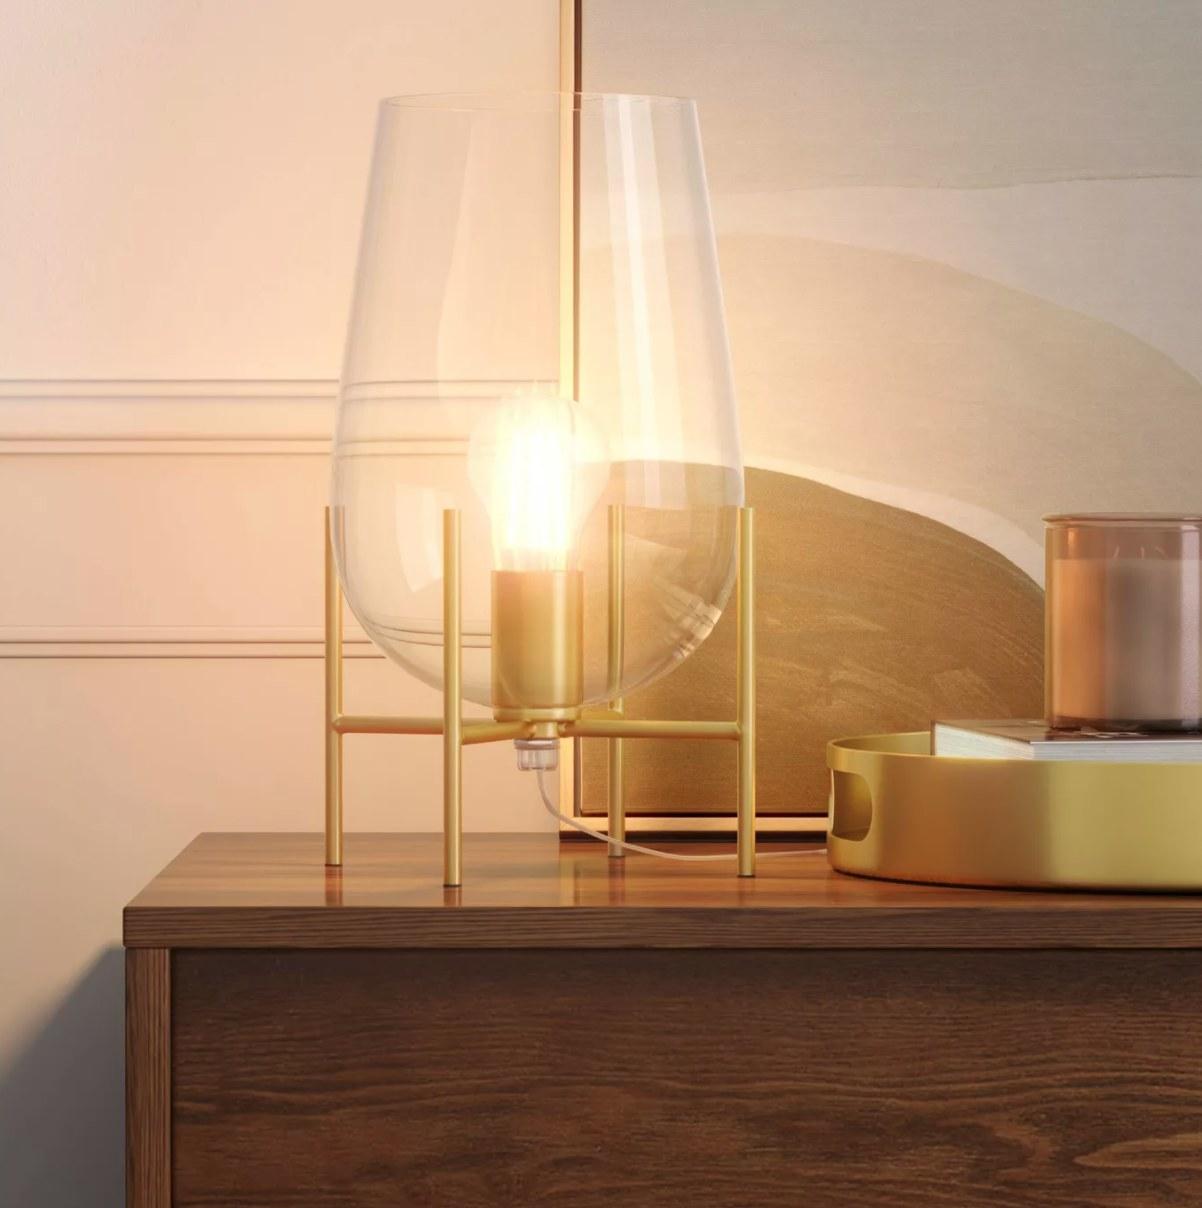 The pedestal lamp